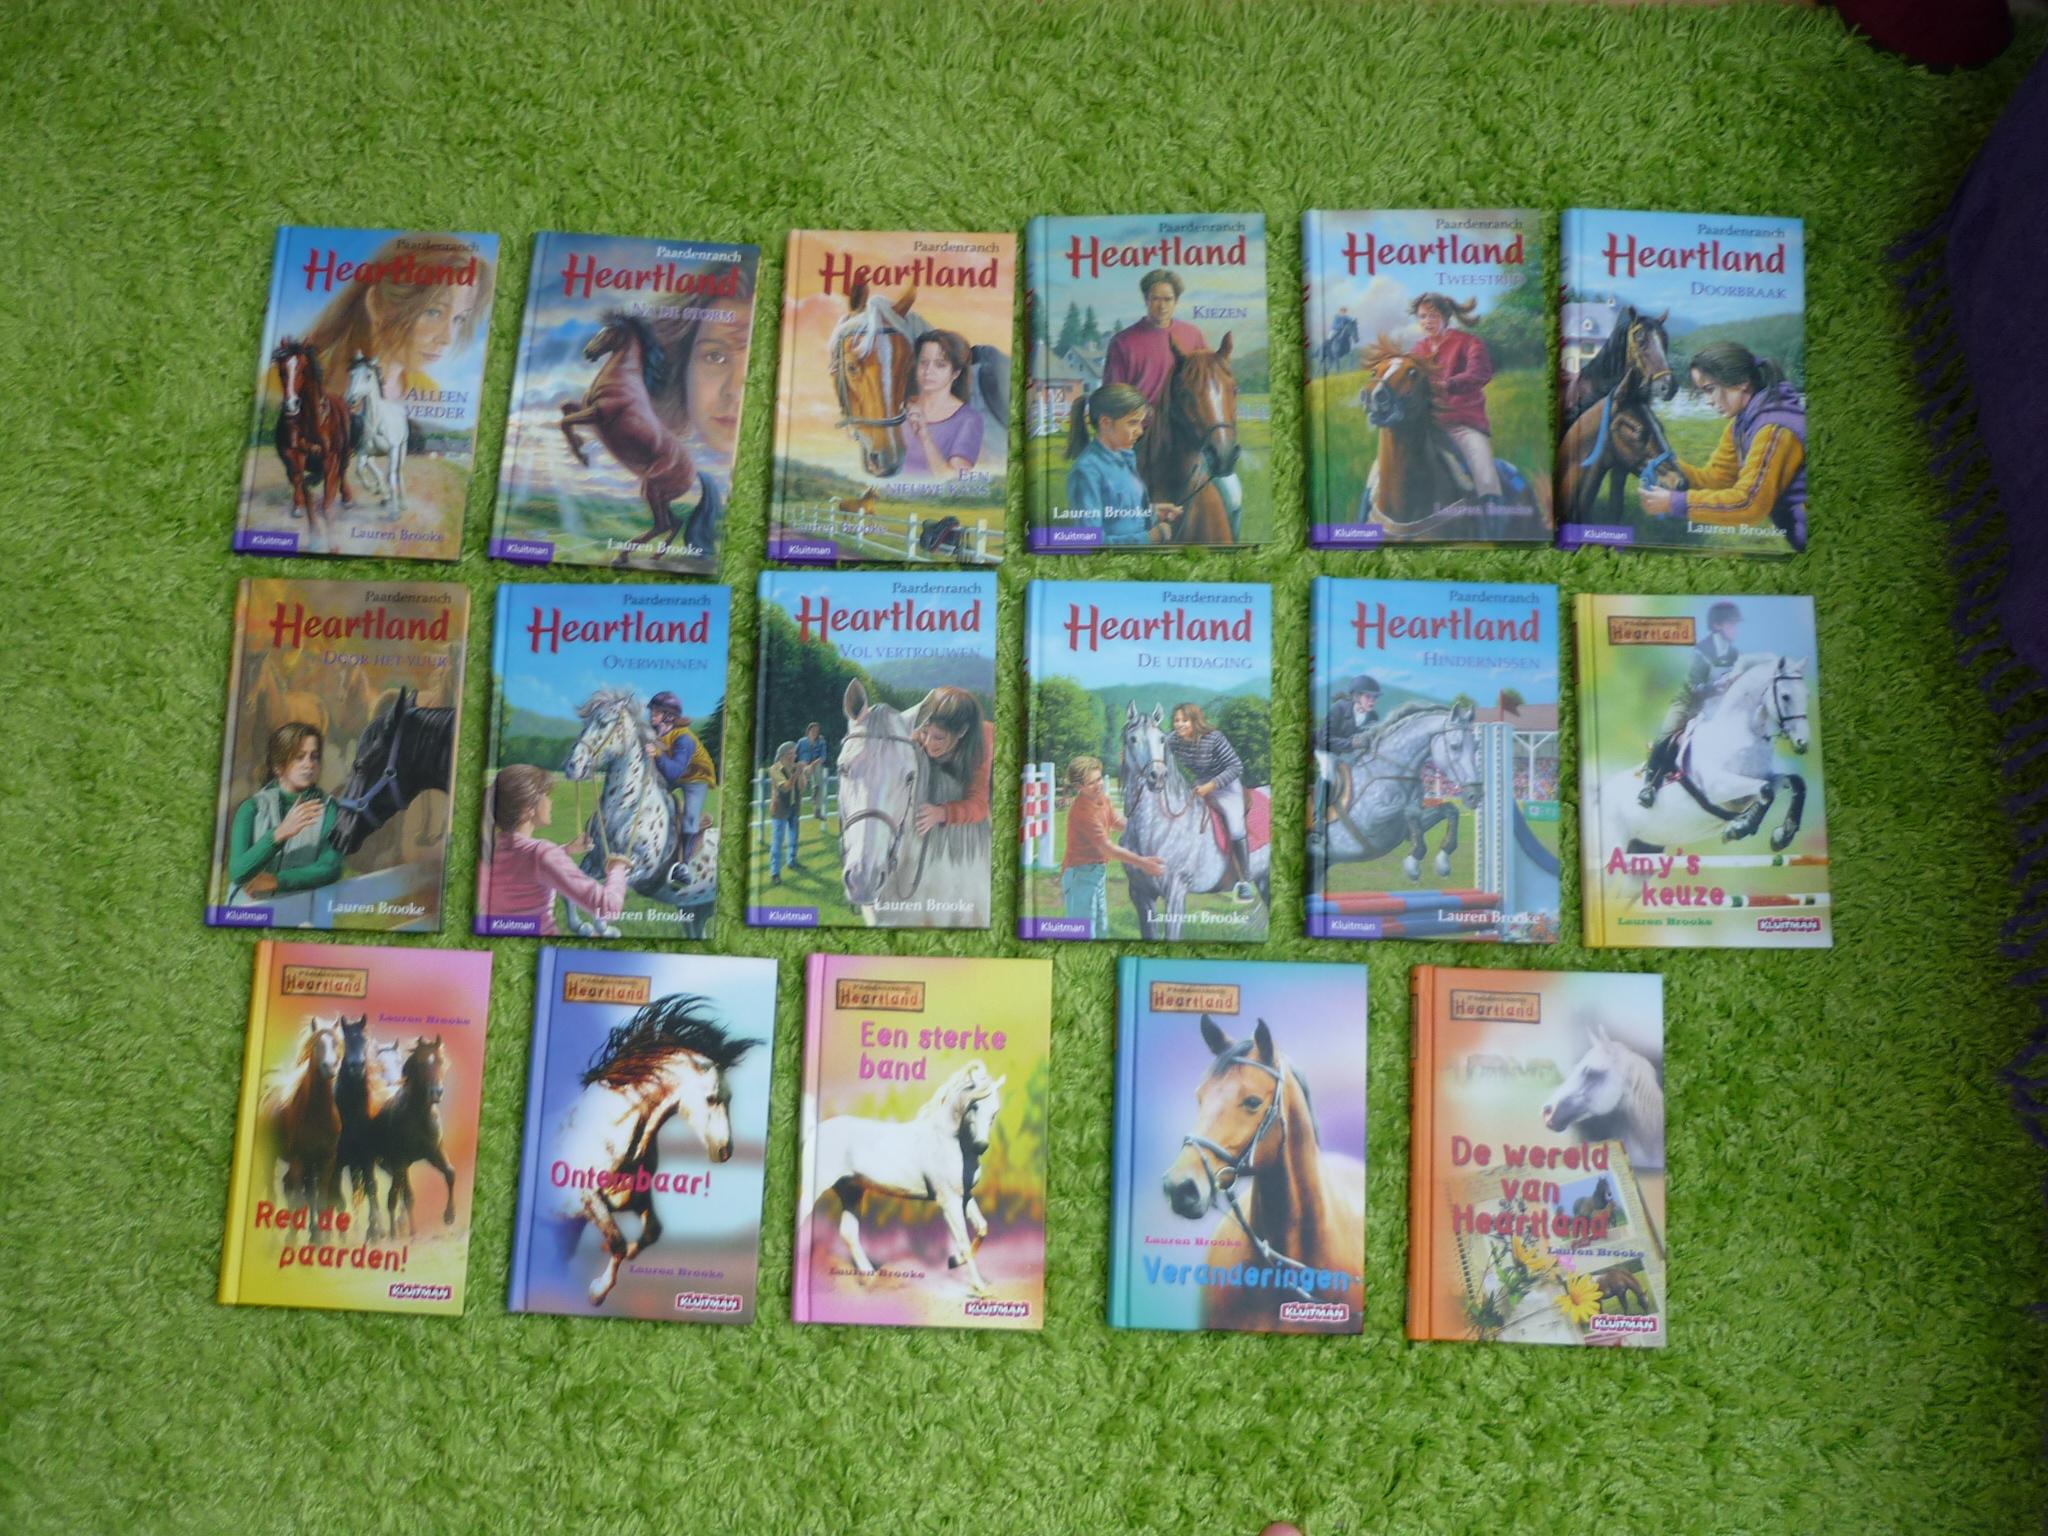 Gehele boekenserie Heartland - 17 boeken | Bokt.nl